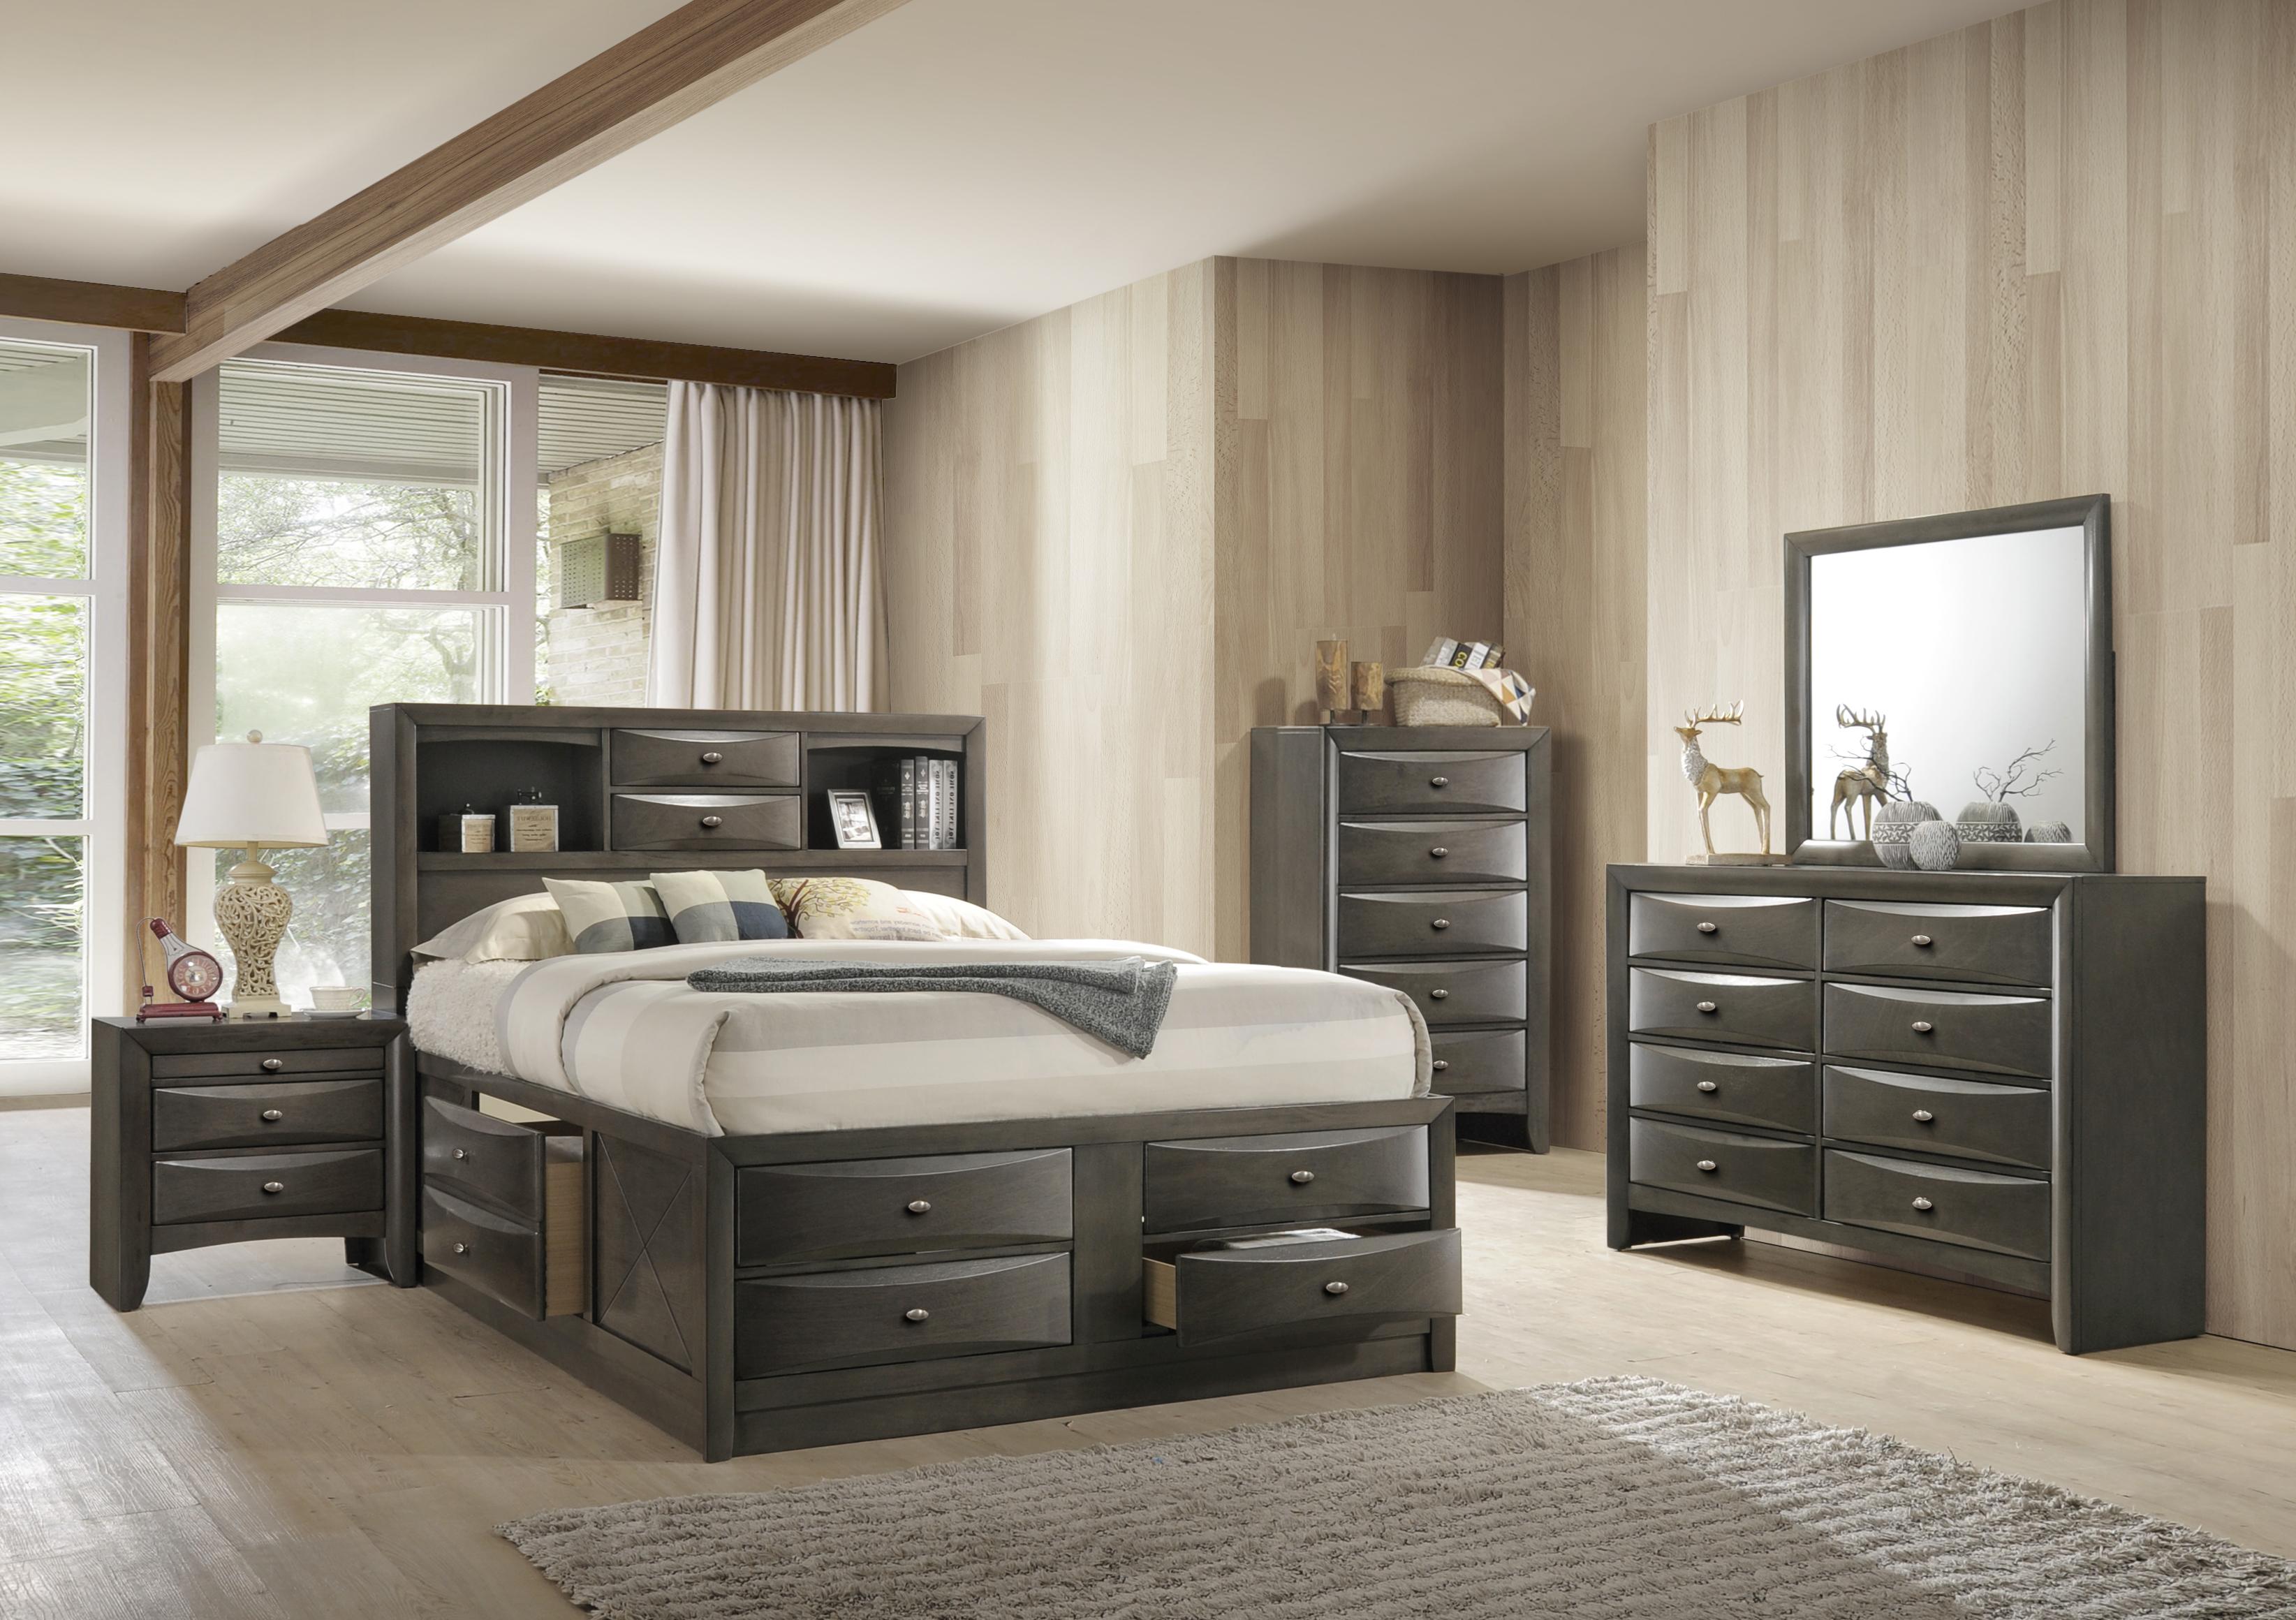 Ultimate Storage Bed Bourne International